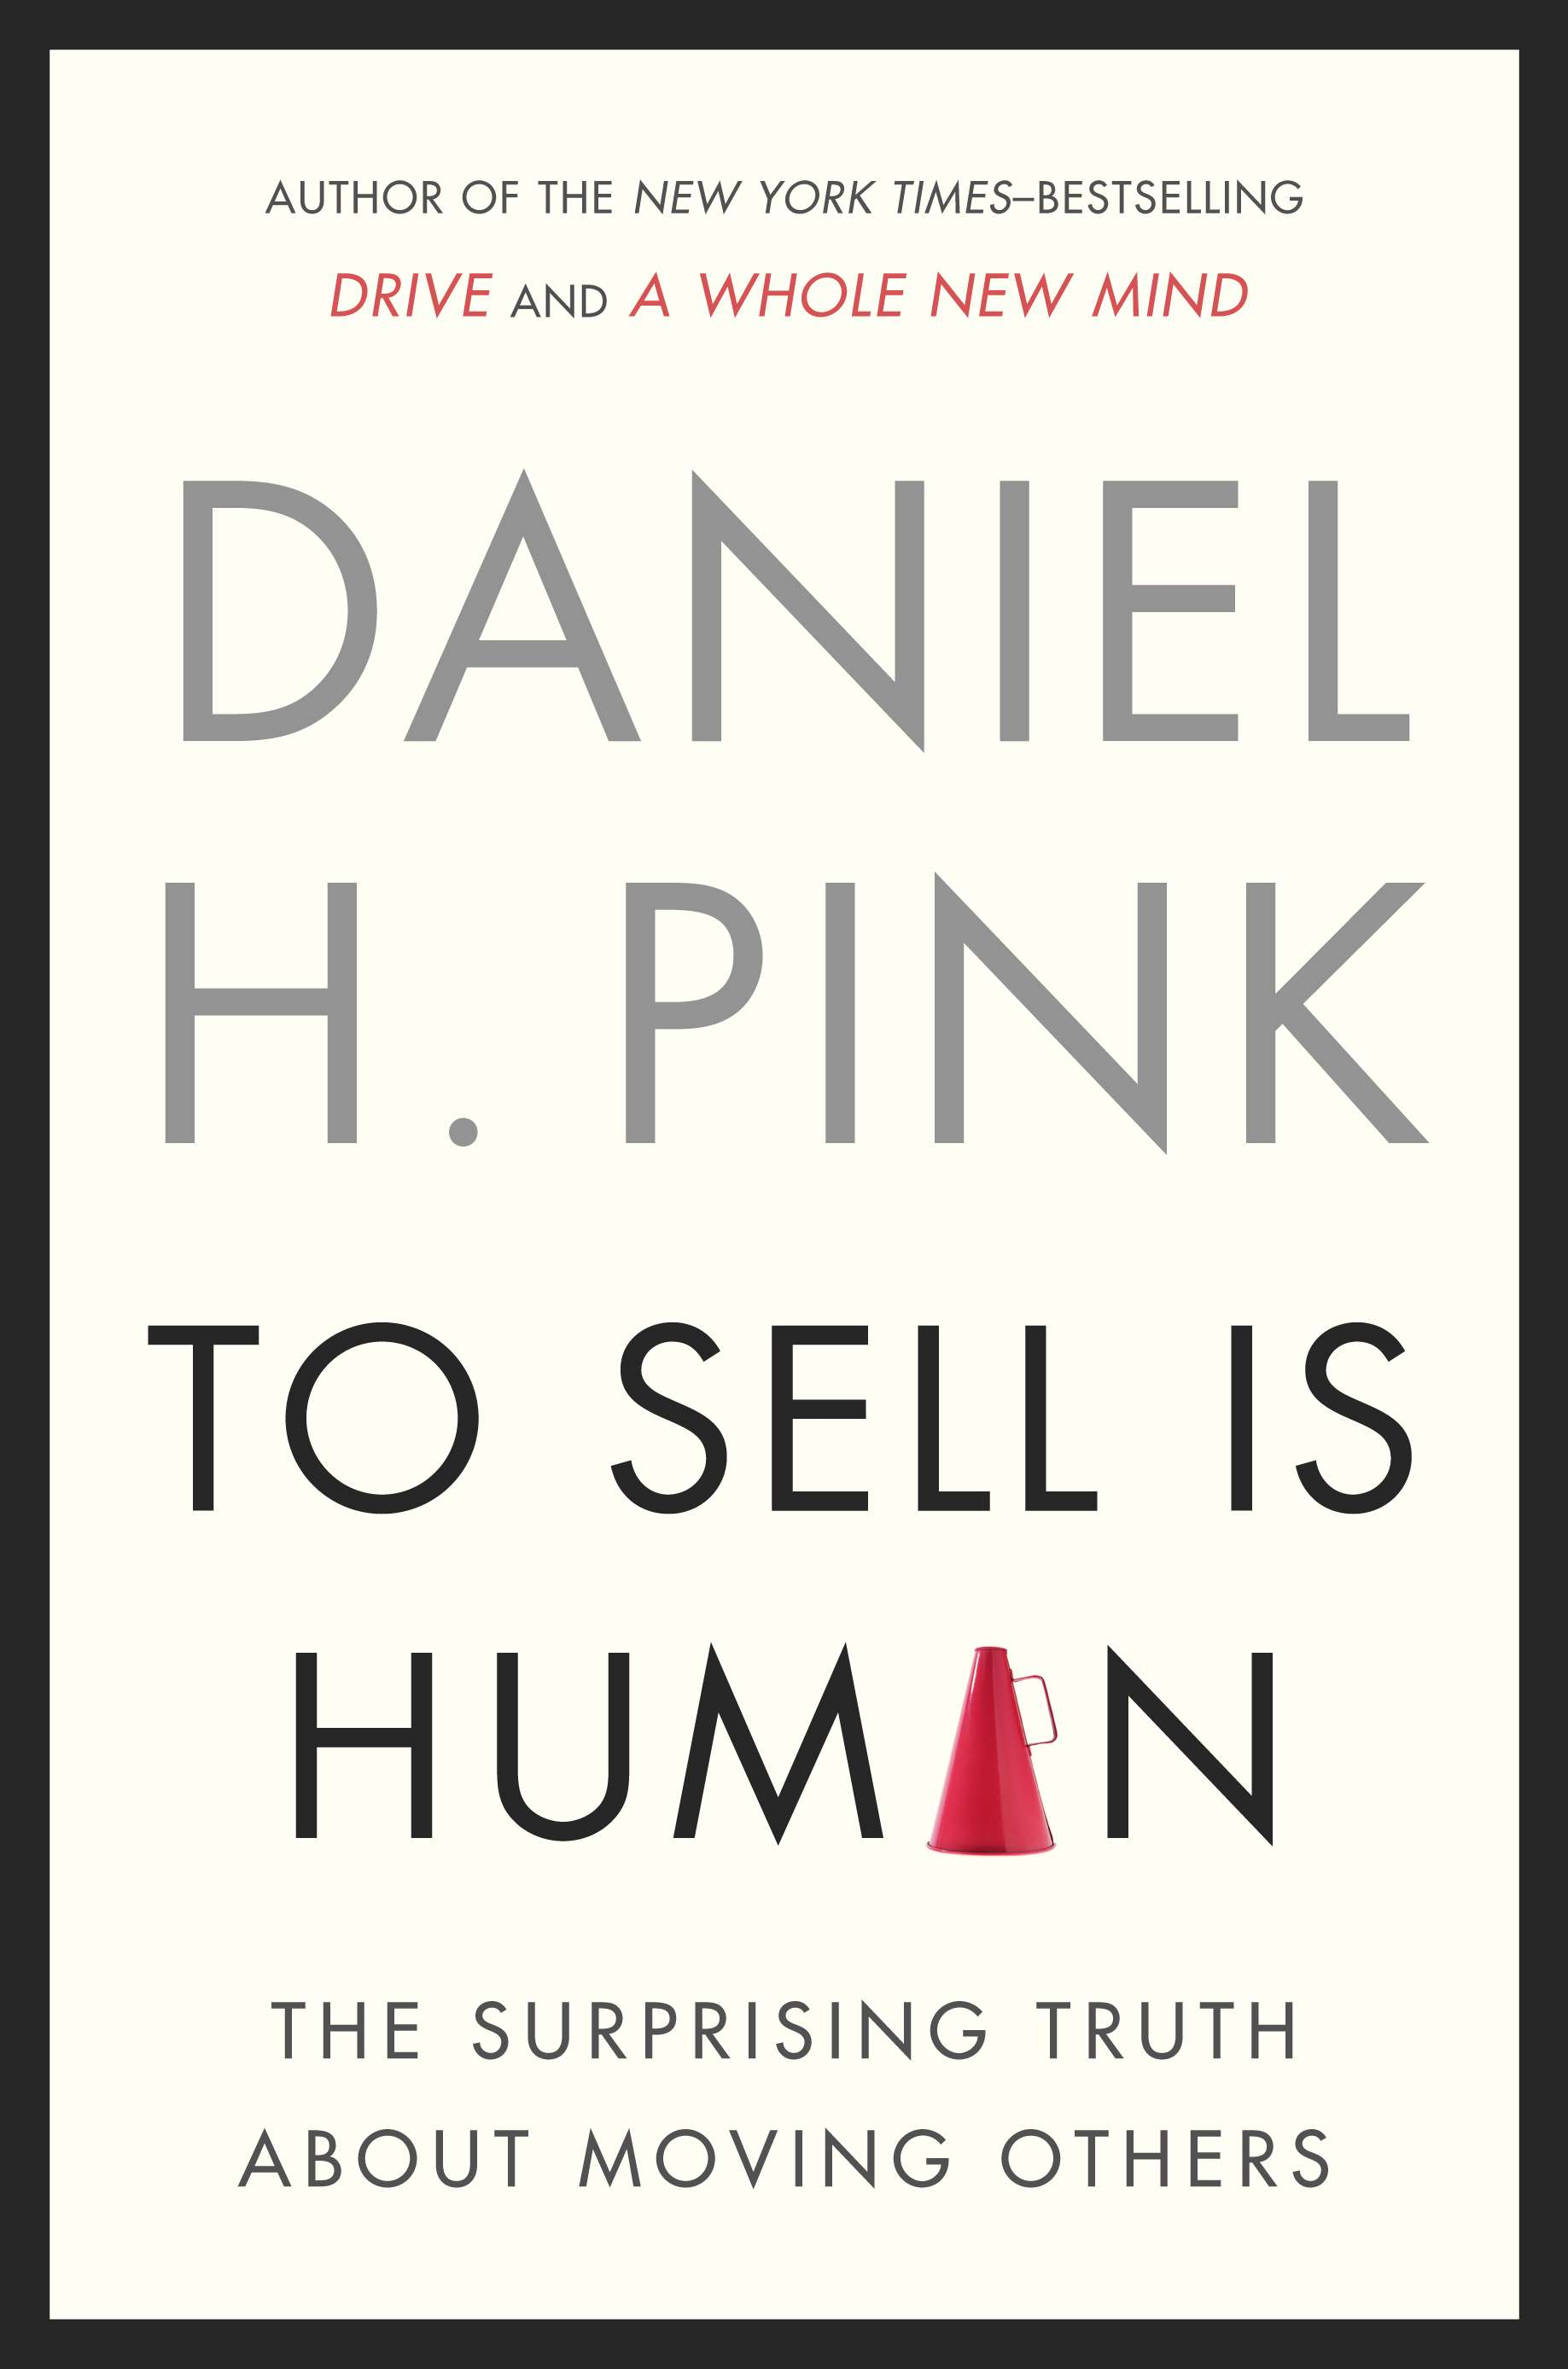 To sell is human techbizdesign hall of fame business